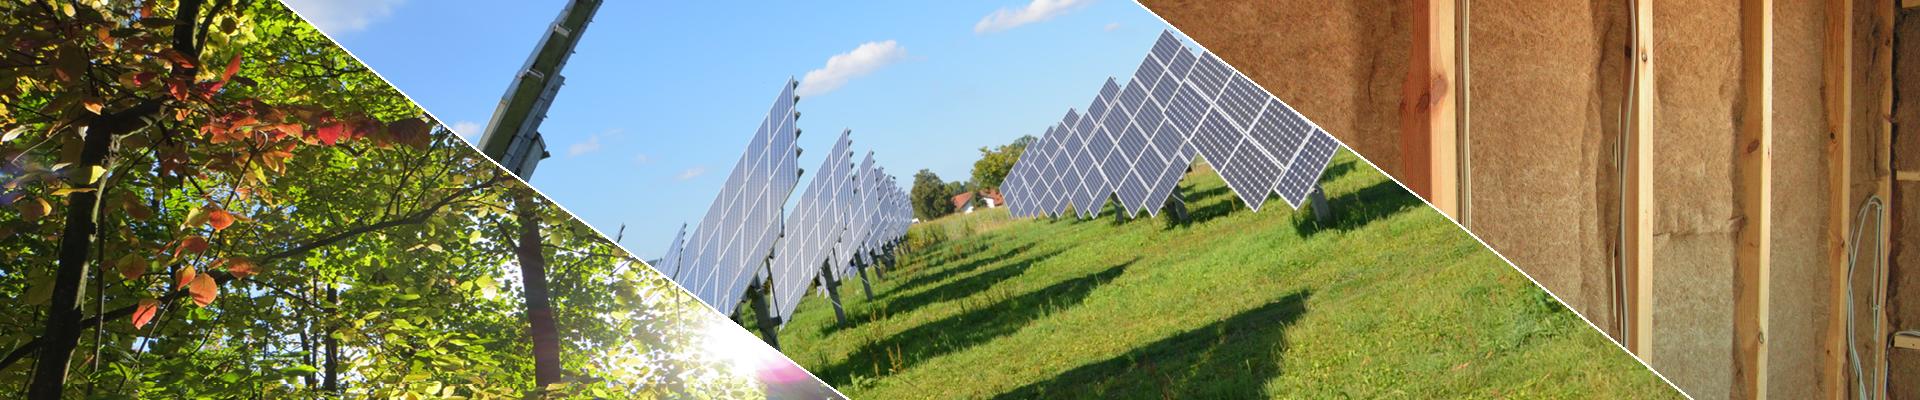 Kategorie: Solarenergie